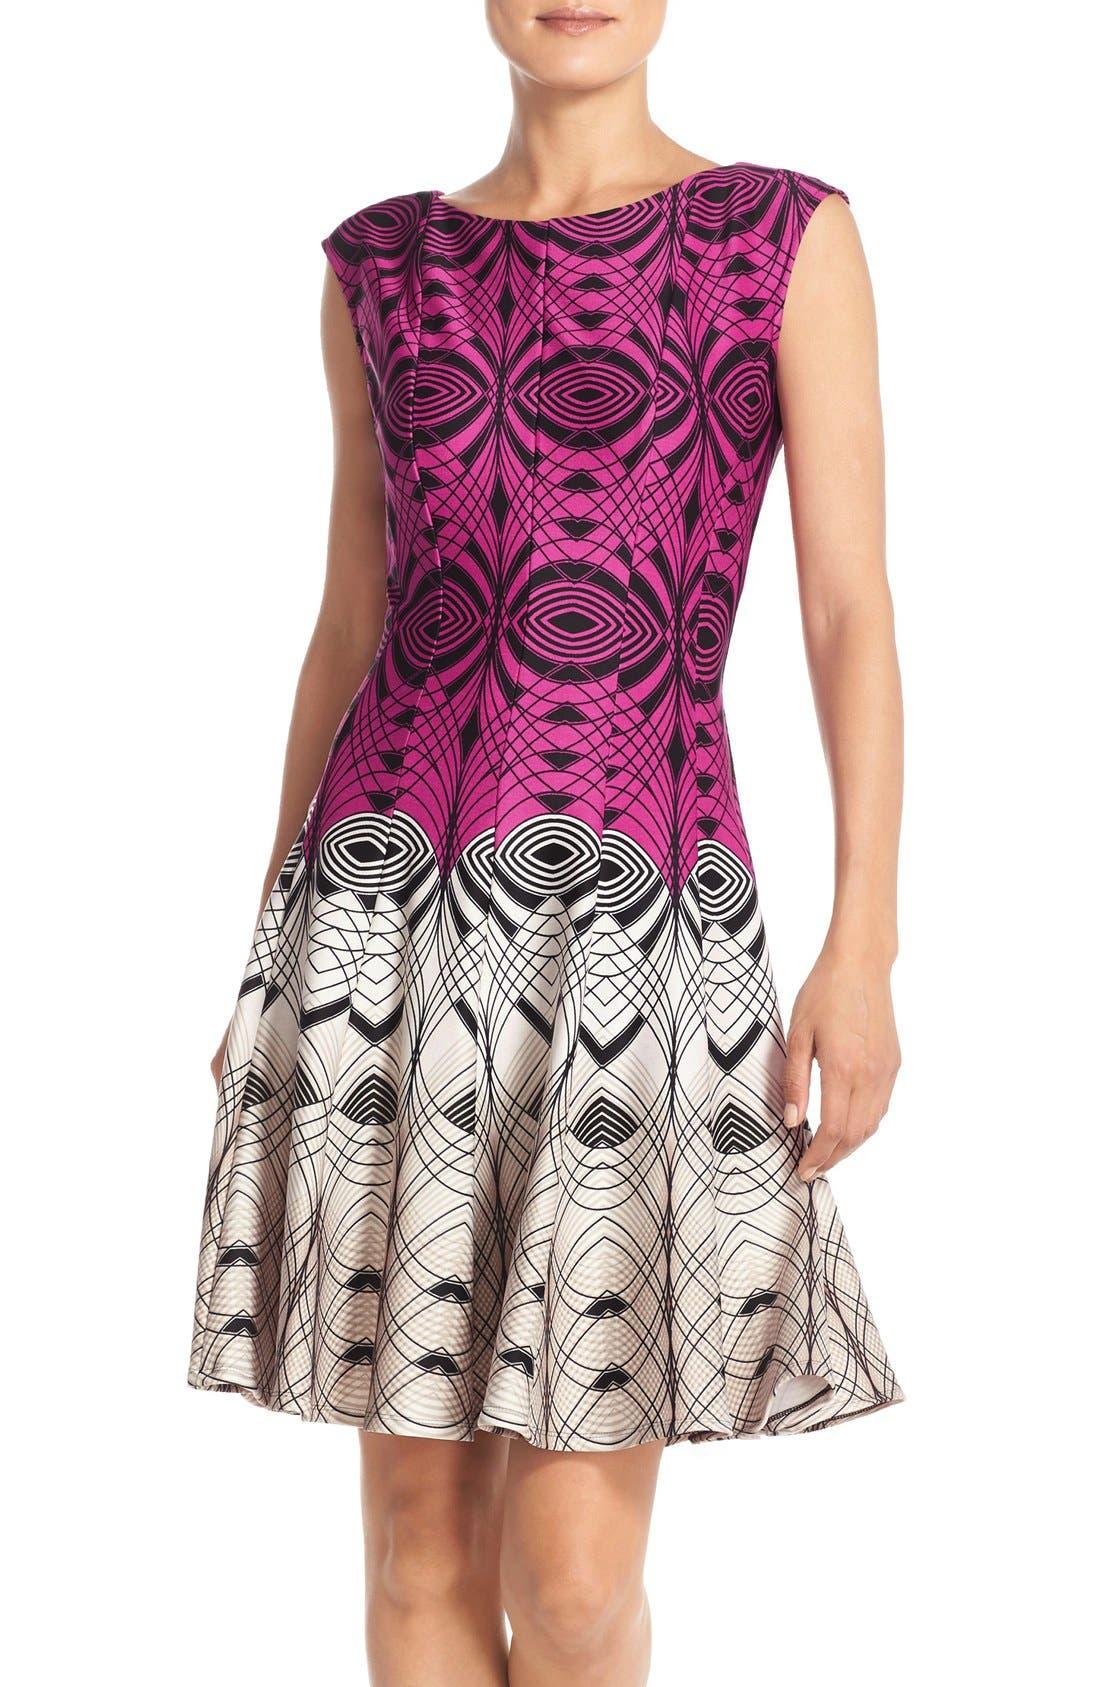 Alternate Image 1 Selected - Gabby Skye Colorblock Print Scuba Fit & Flare Dress